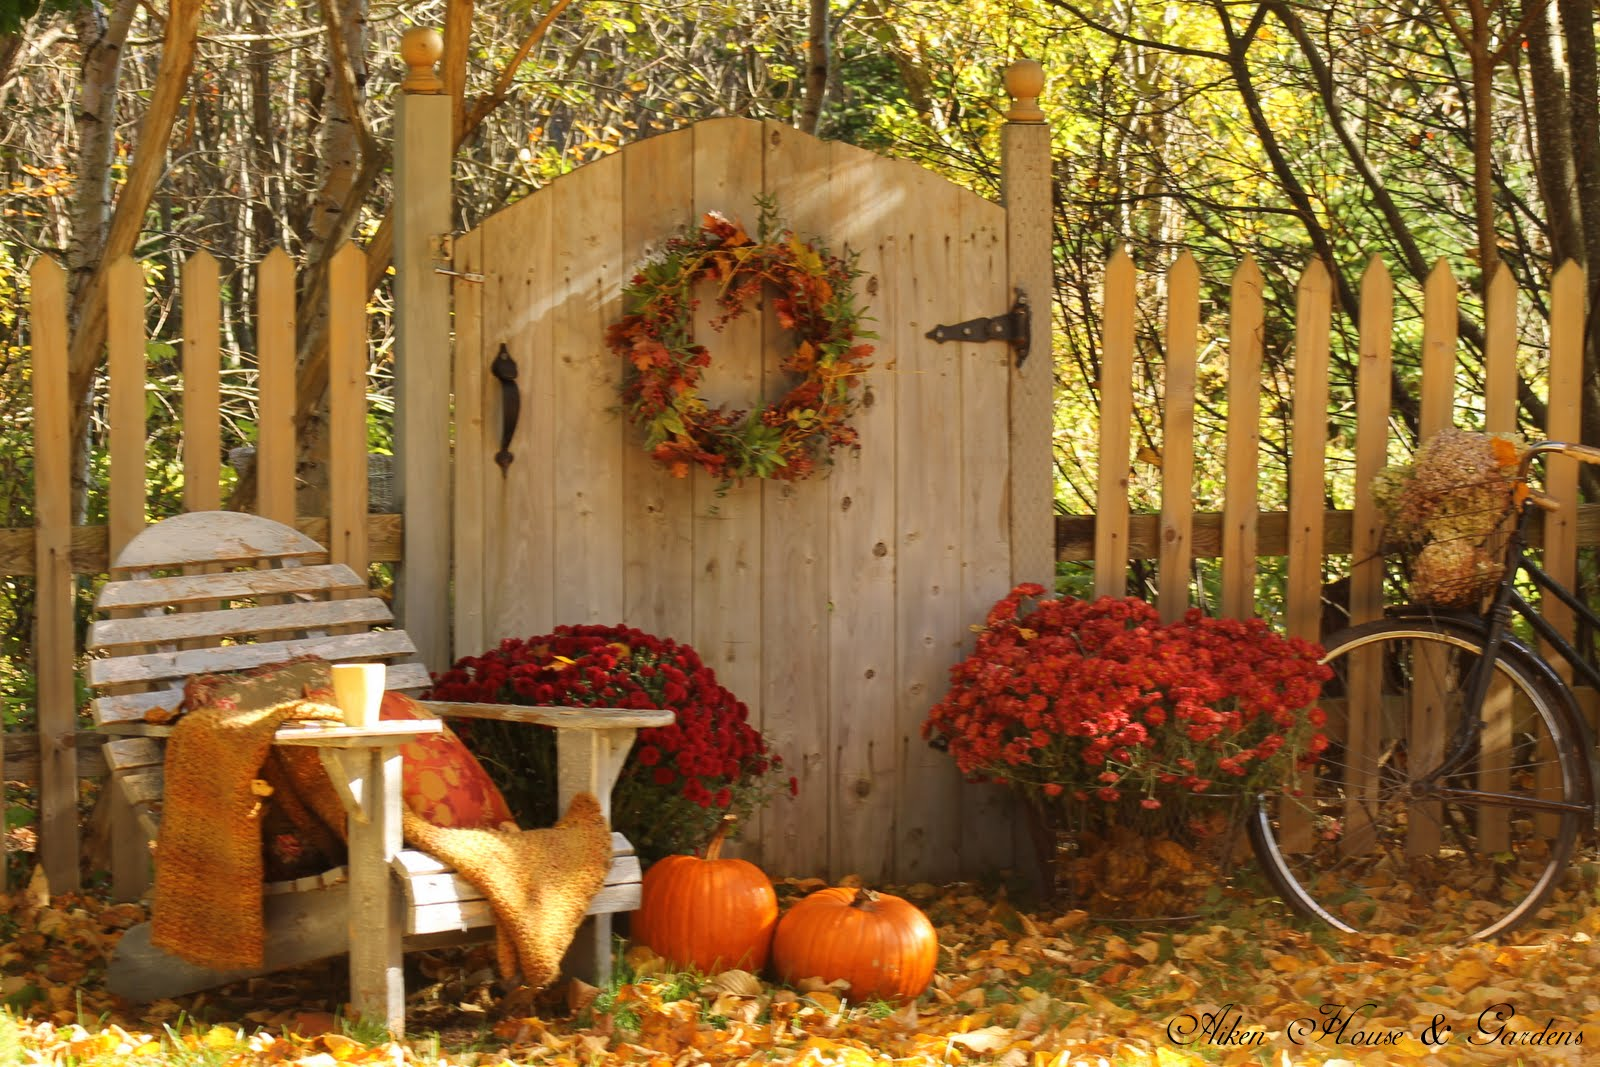 Aiken house gardens sunny autumn respite for Aiken house